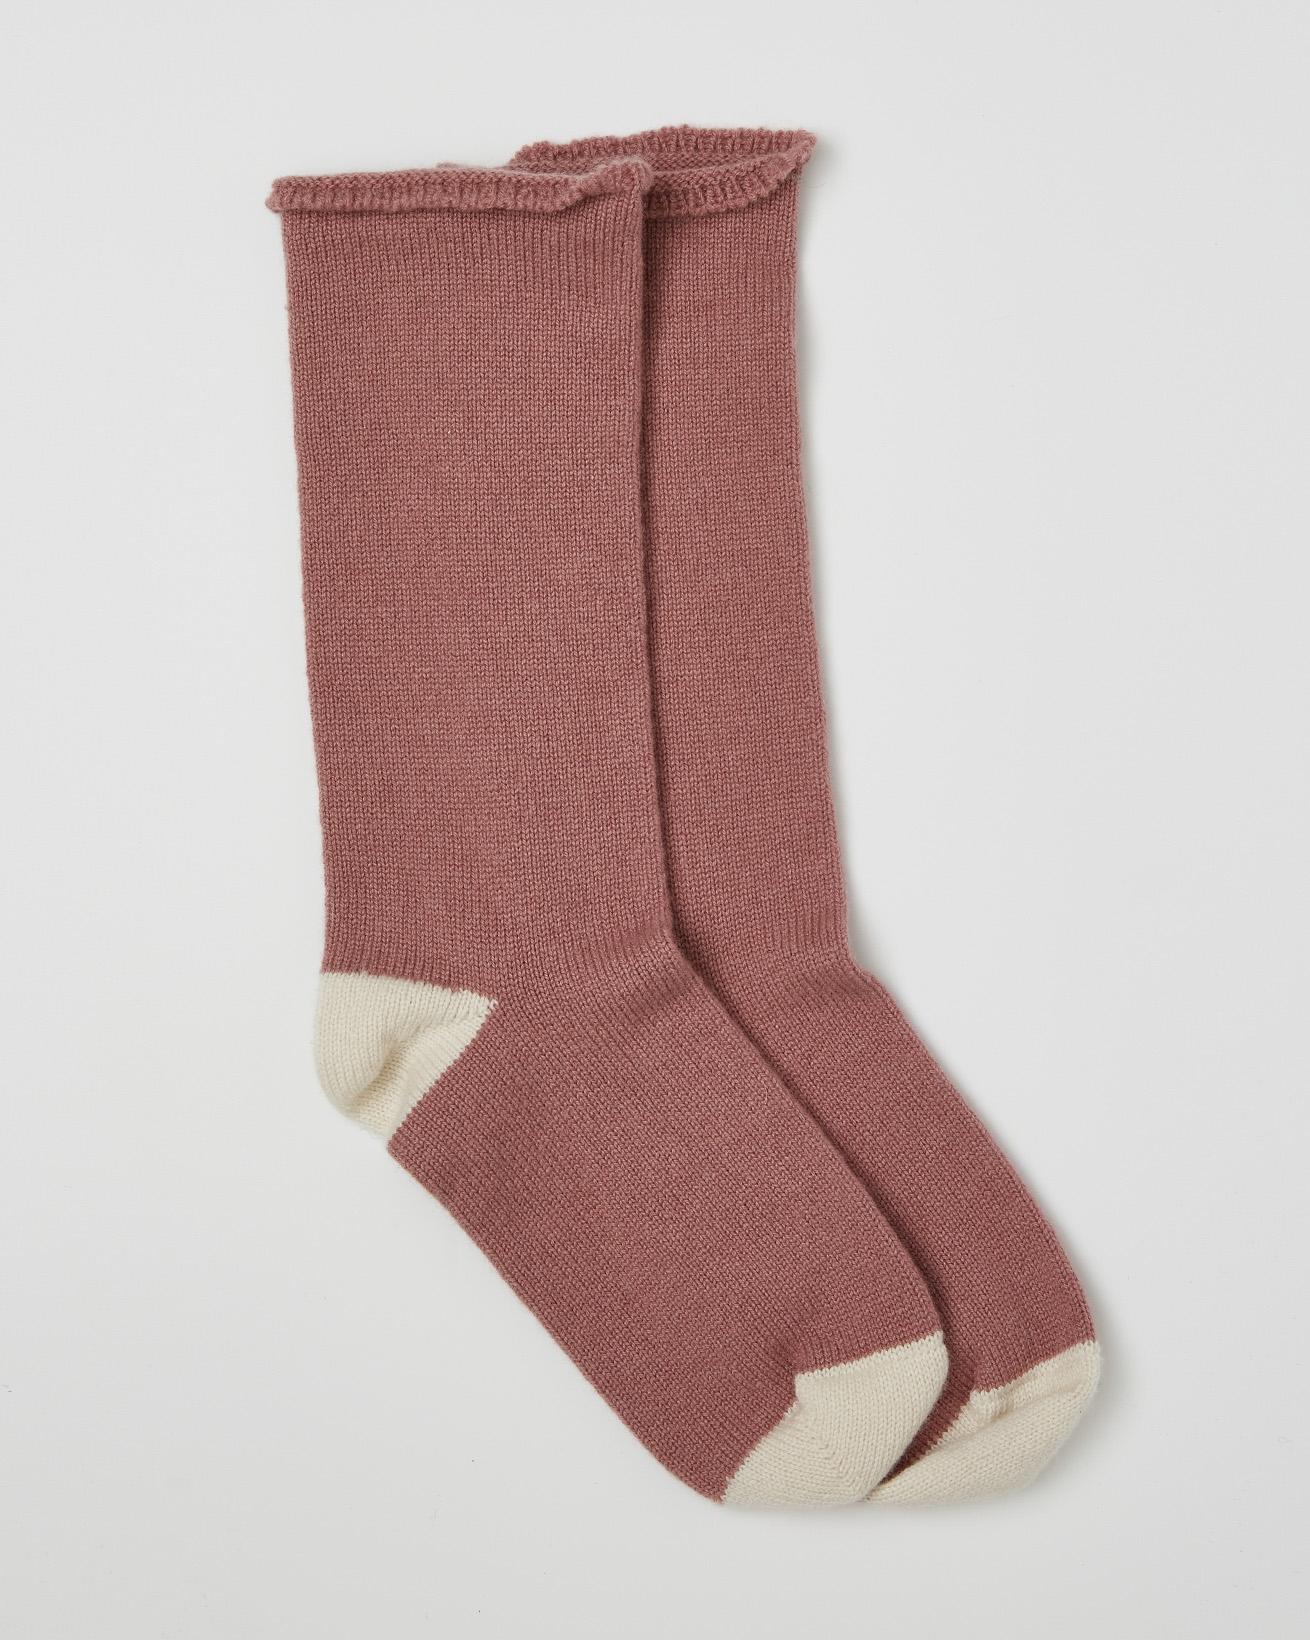 Ladies Pure Cashmere Lounge Socks - Berry - Size Medium - 2530